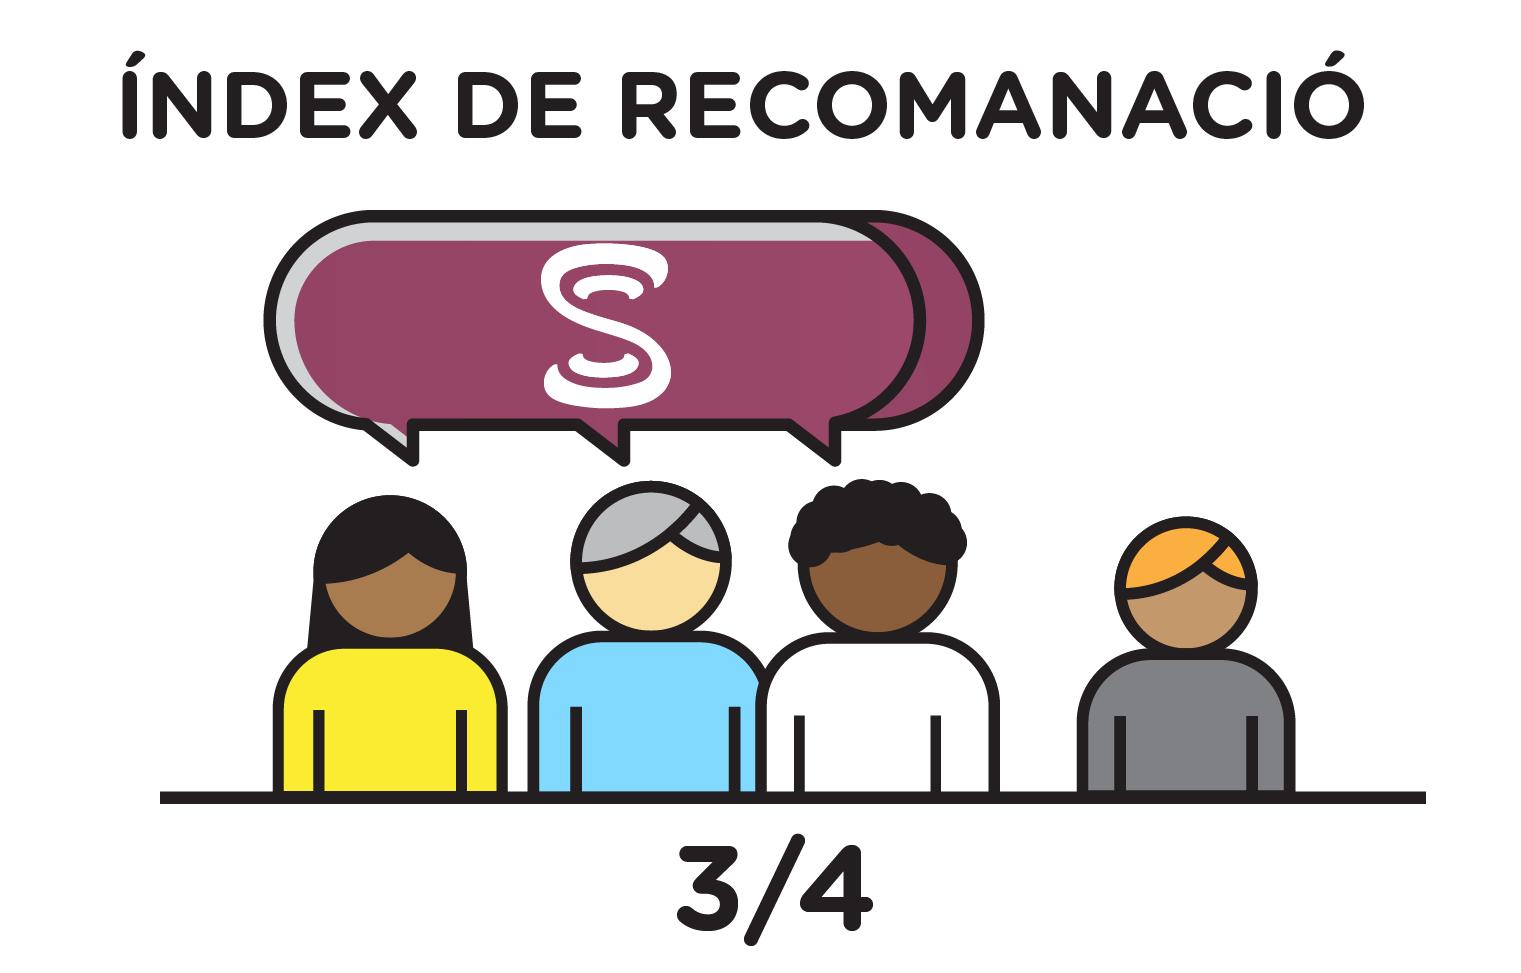 3 de cada 4 recomanen Som Connexió